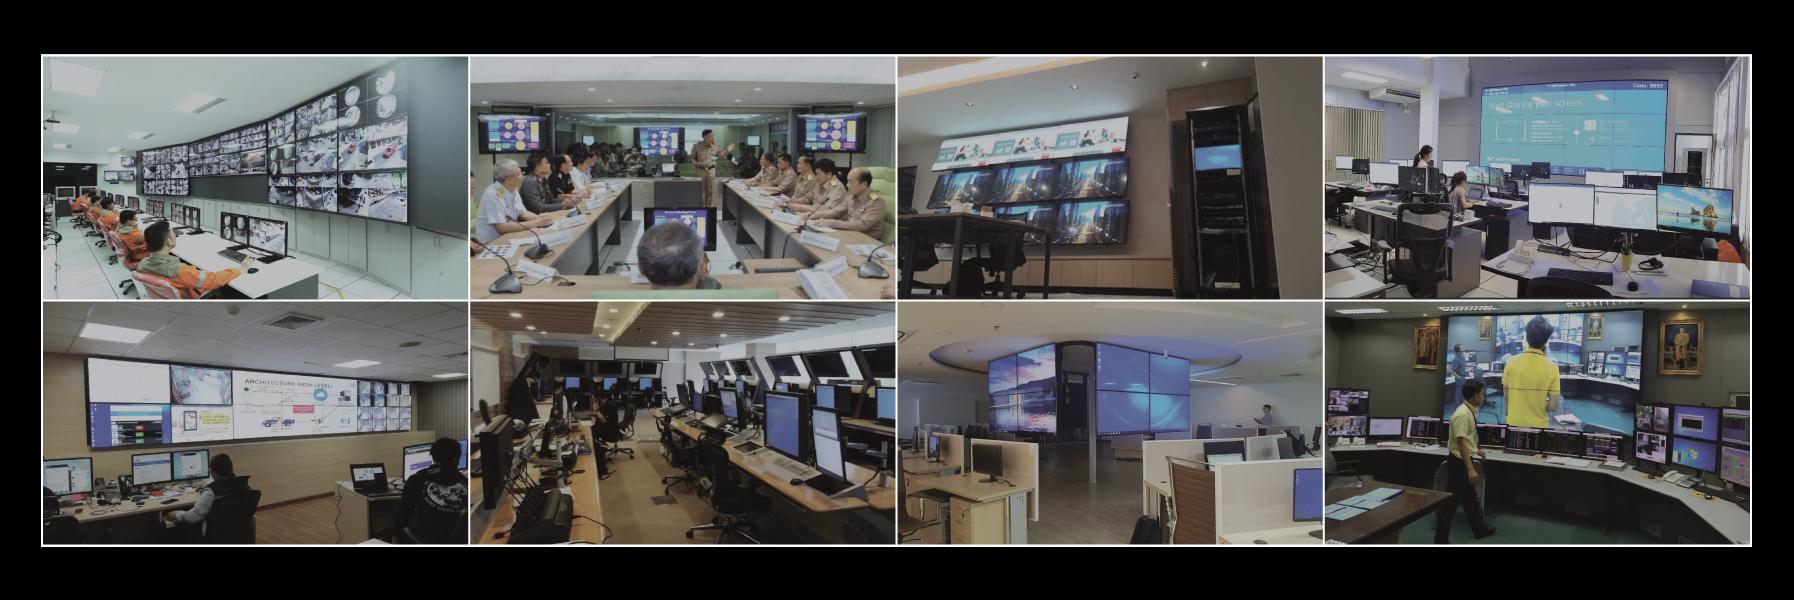 control_room.png